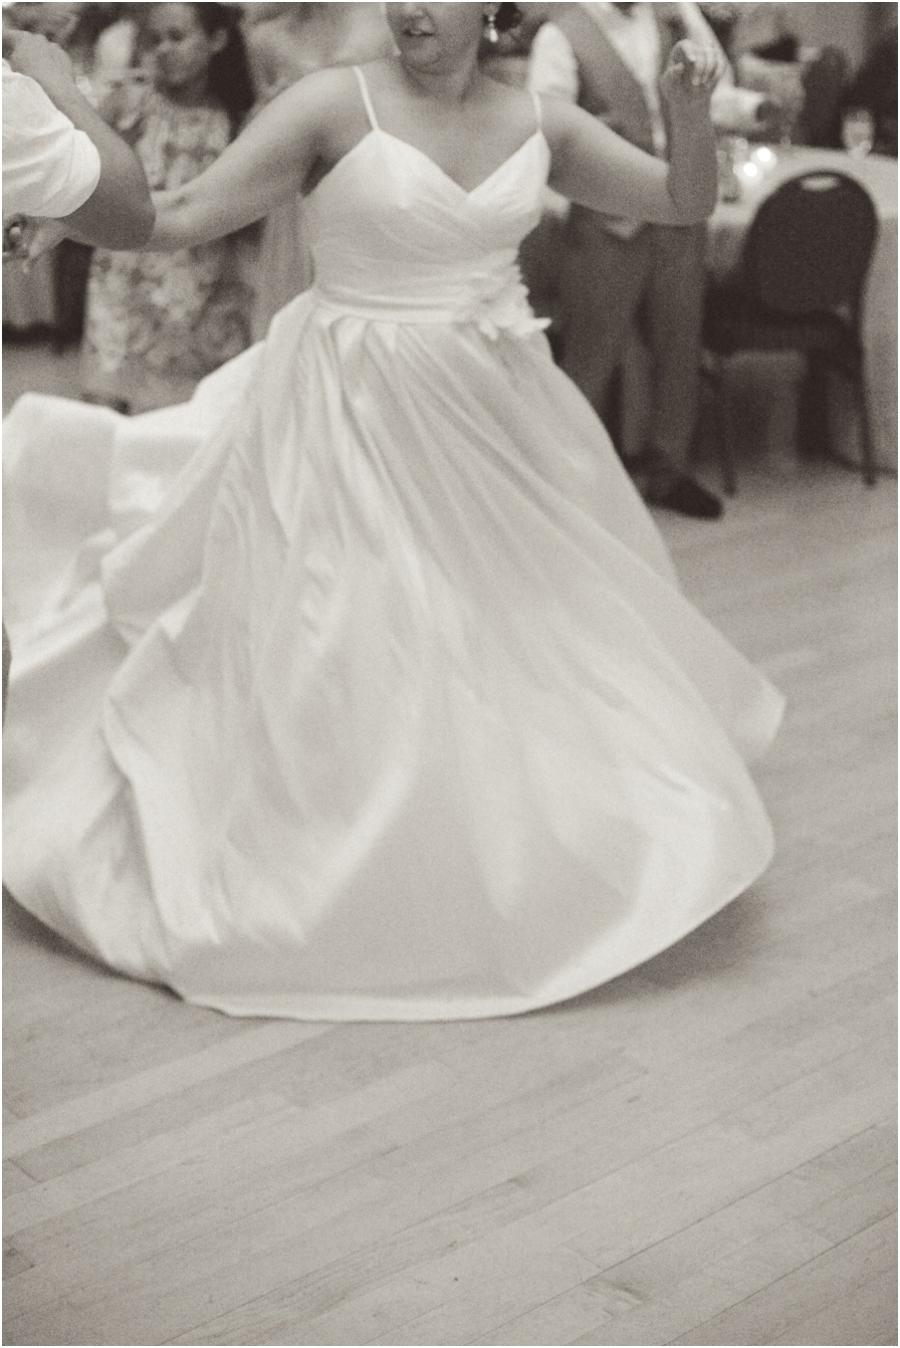 bride twirling on the dancing floor, vintage wedding photographers